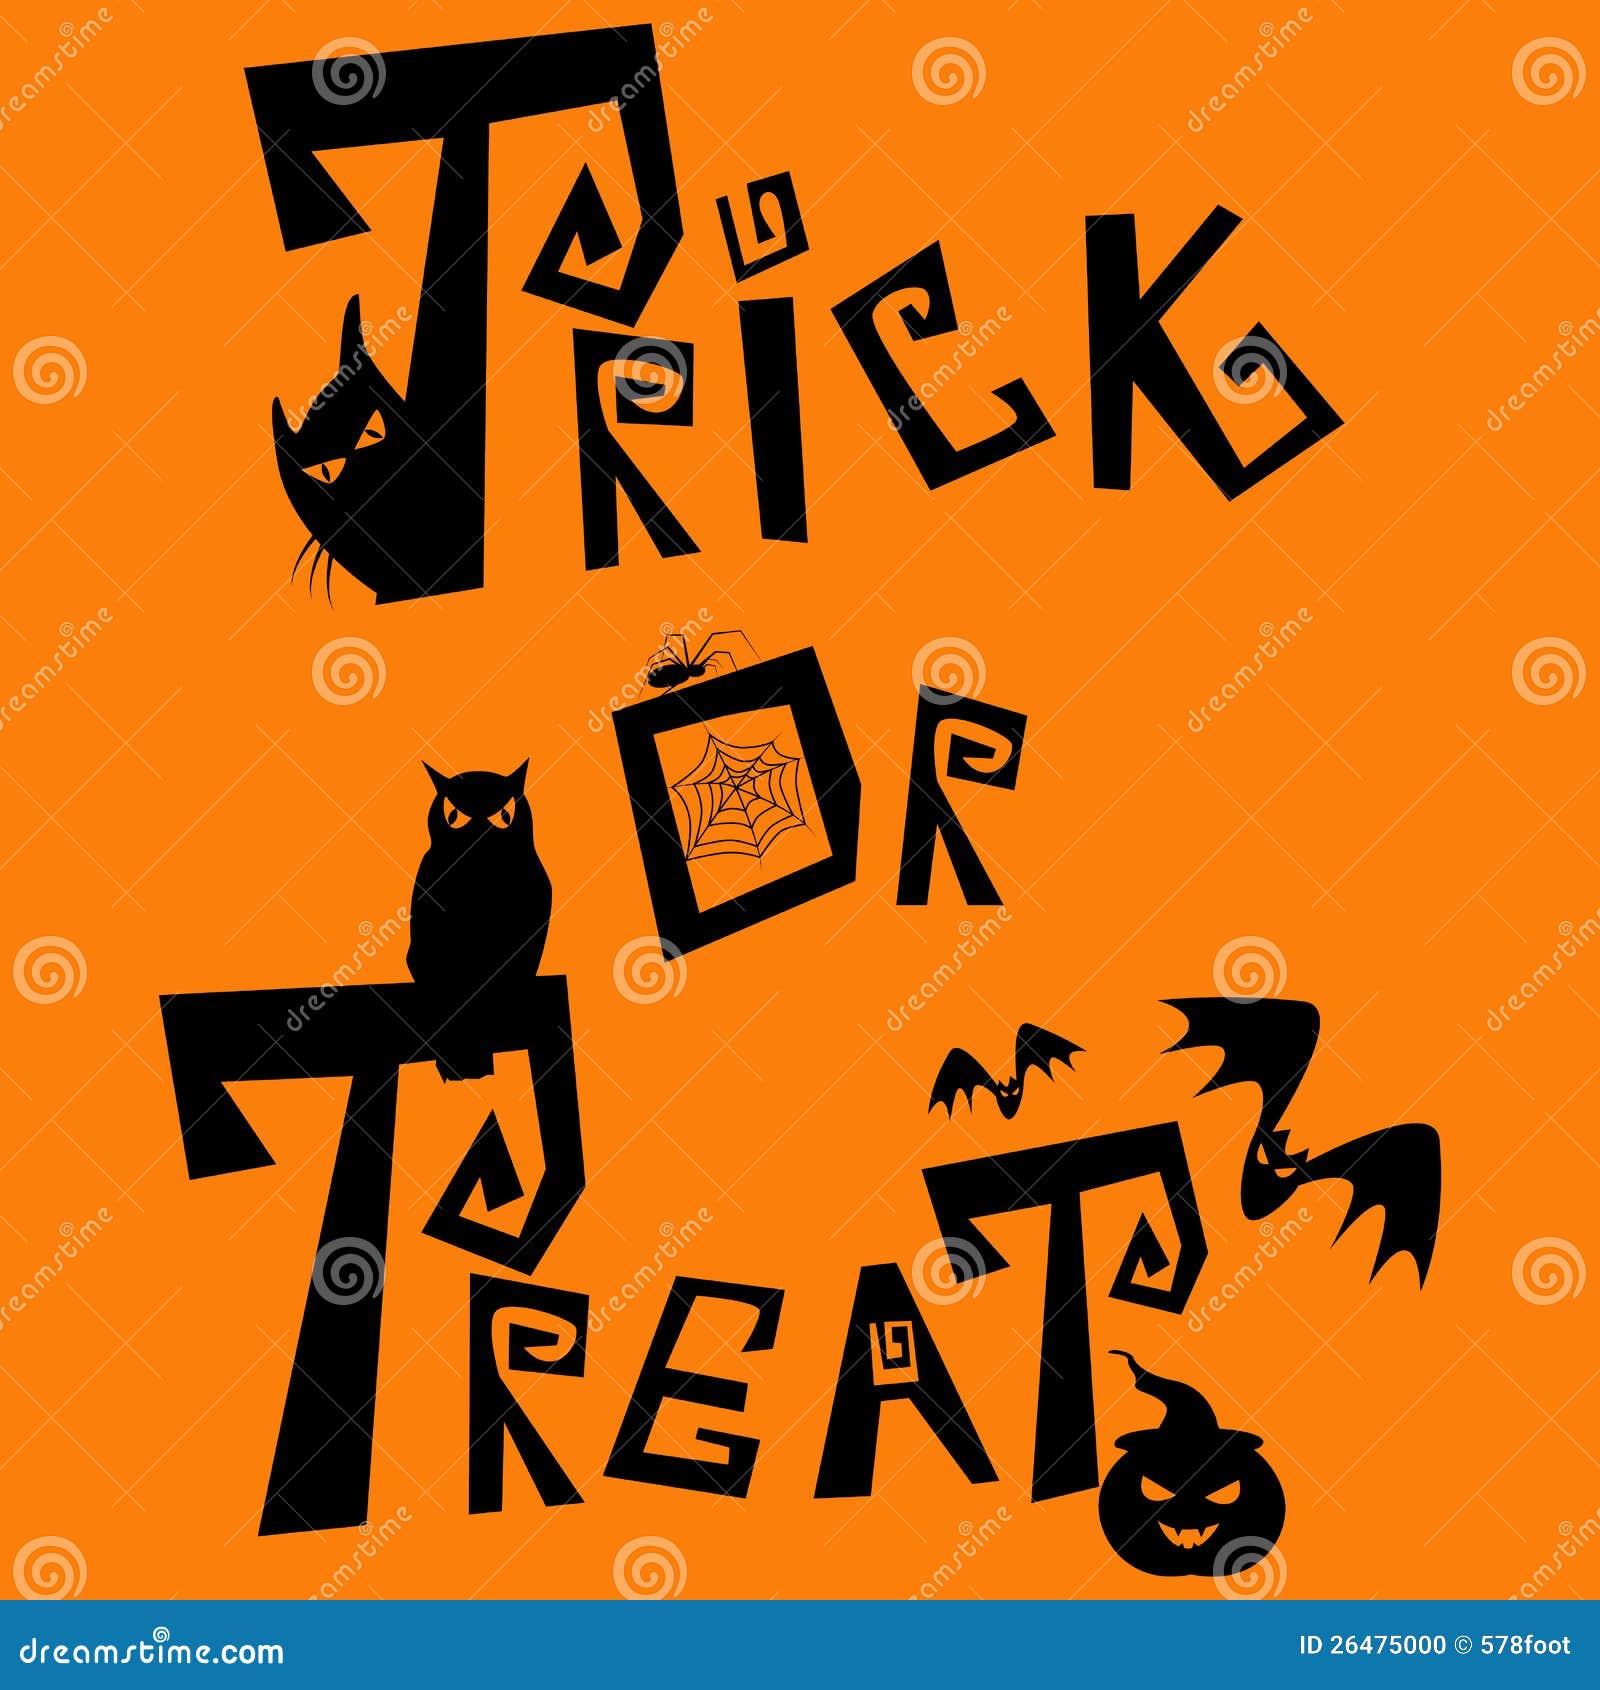 Trick eller treat